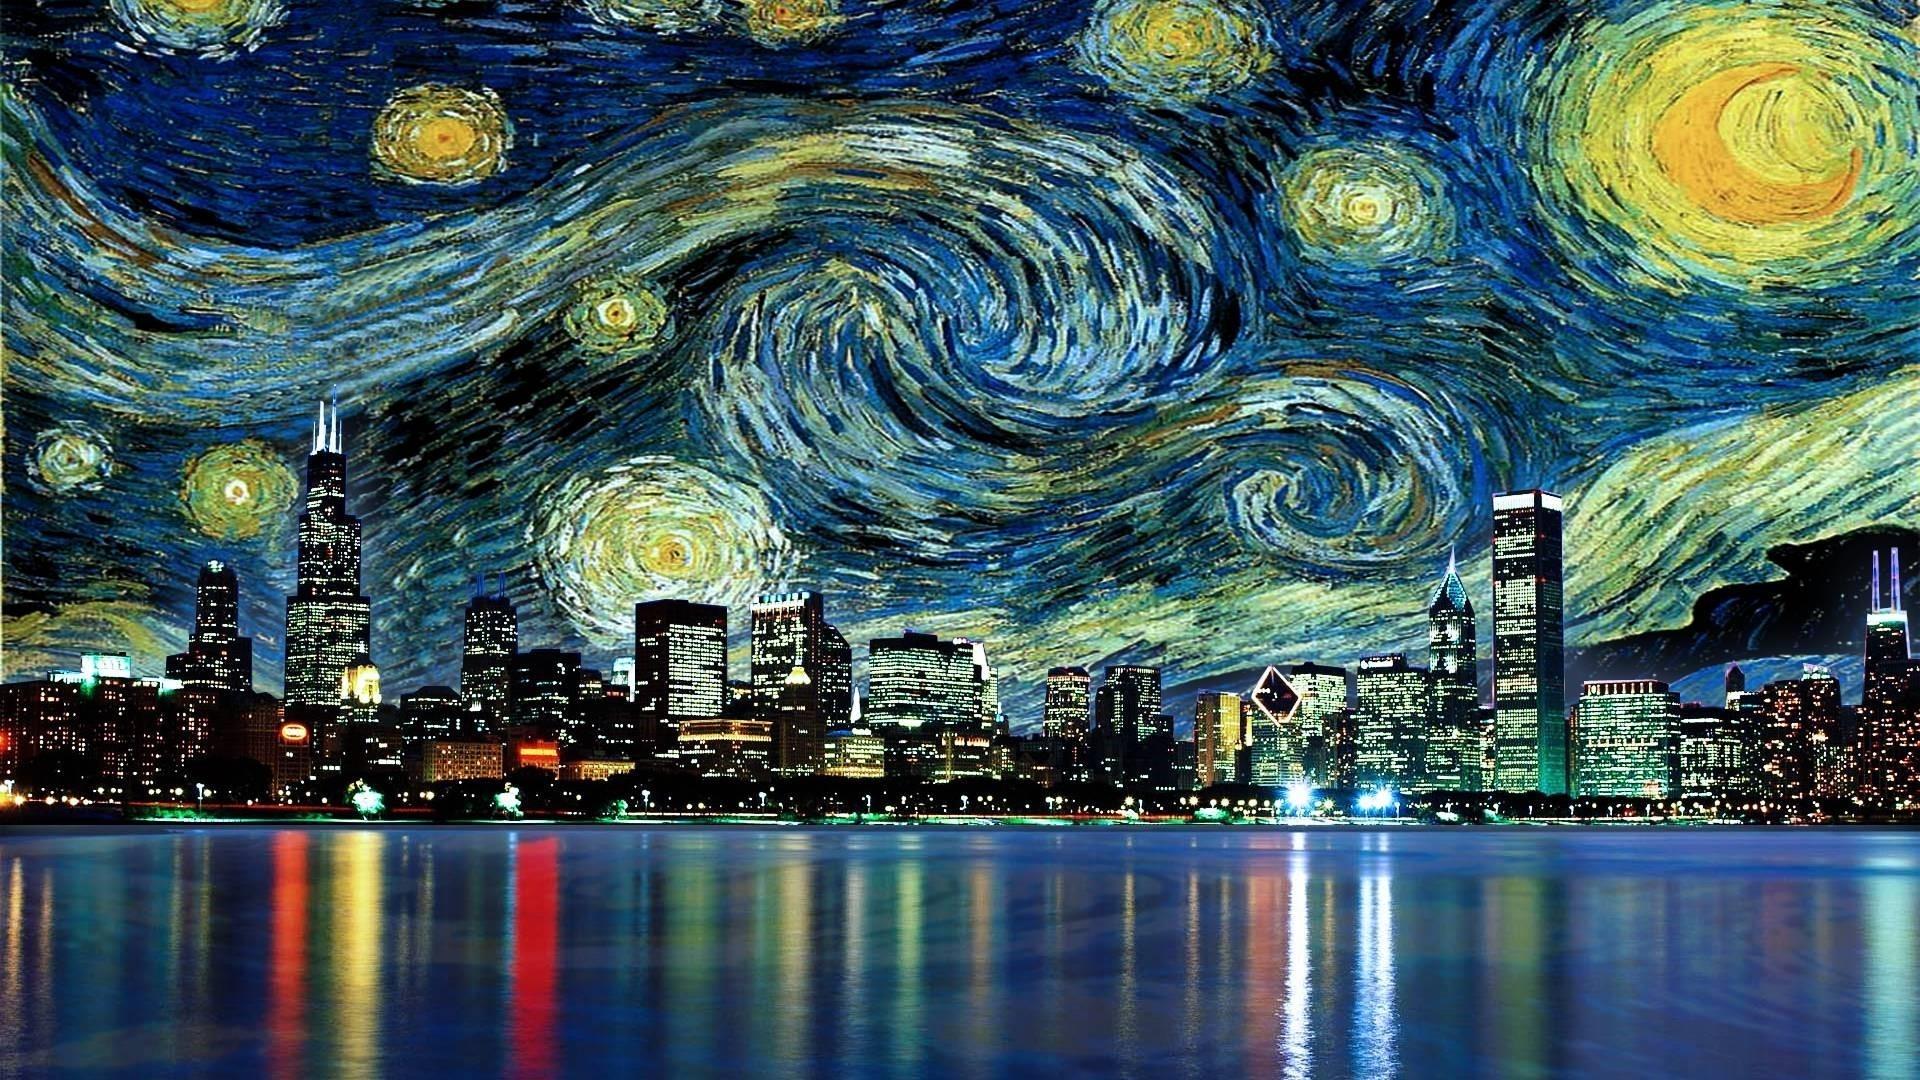 vincent van gogh - the starry night wallpaper | wallpaper studio 10